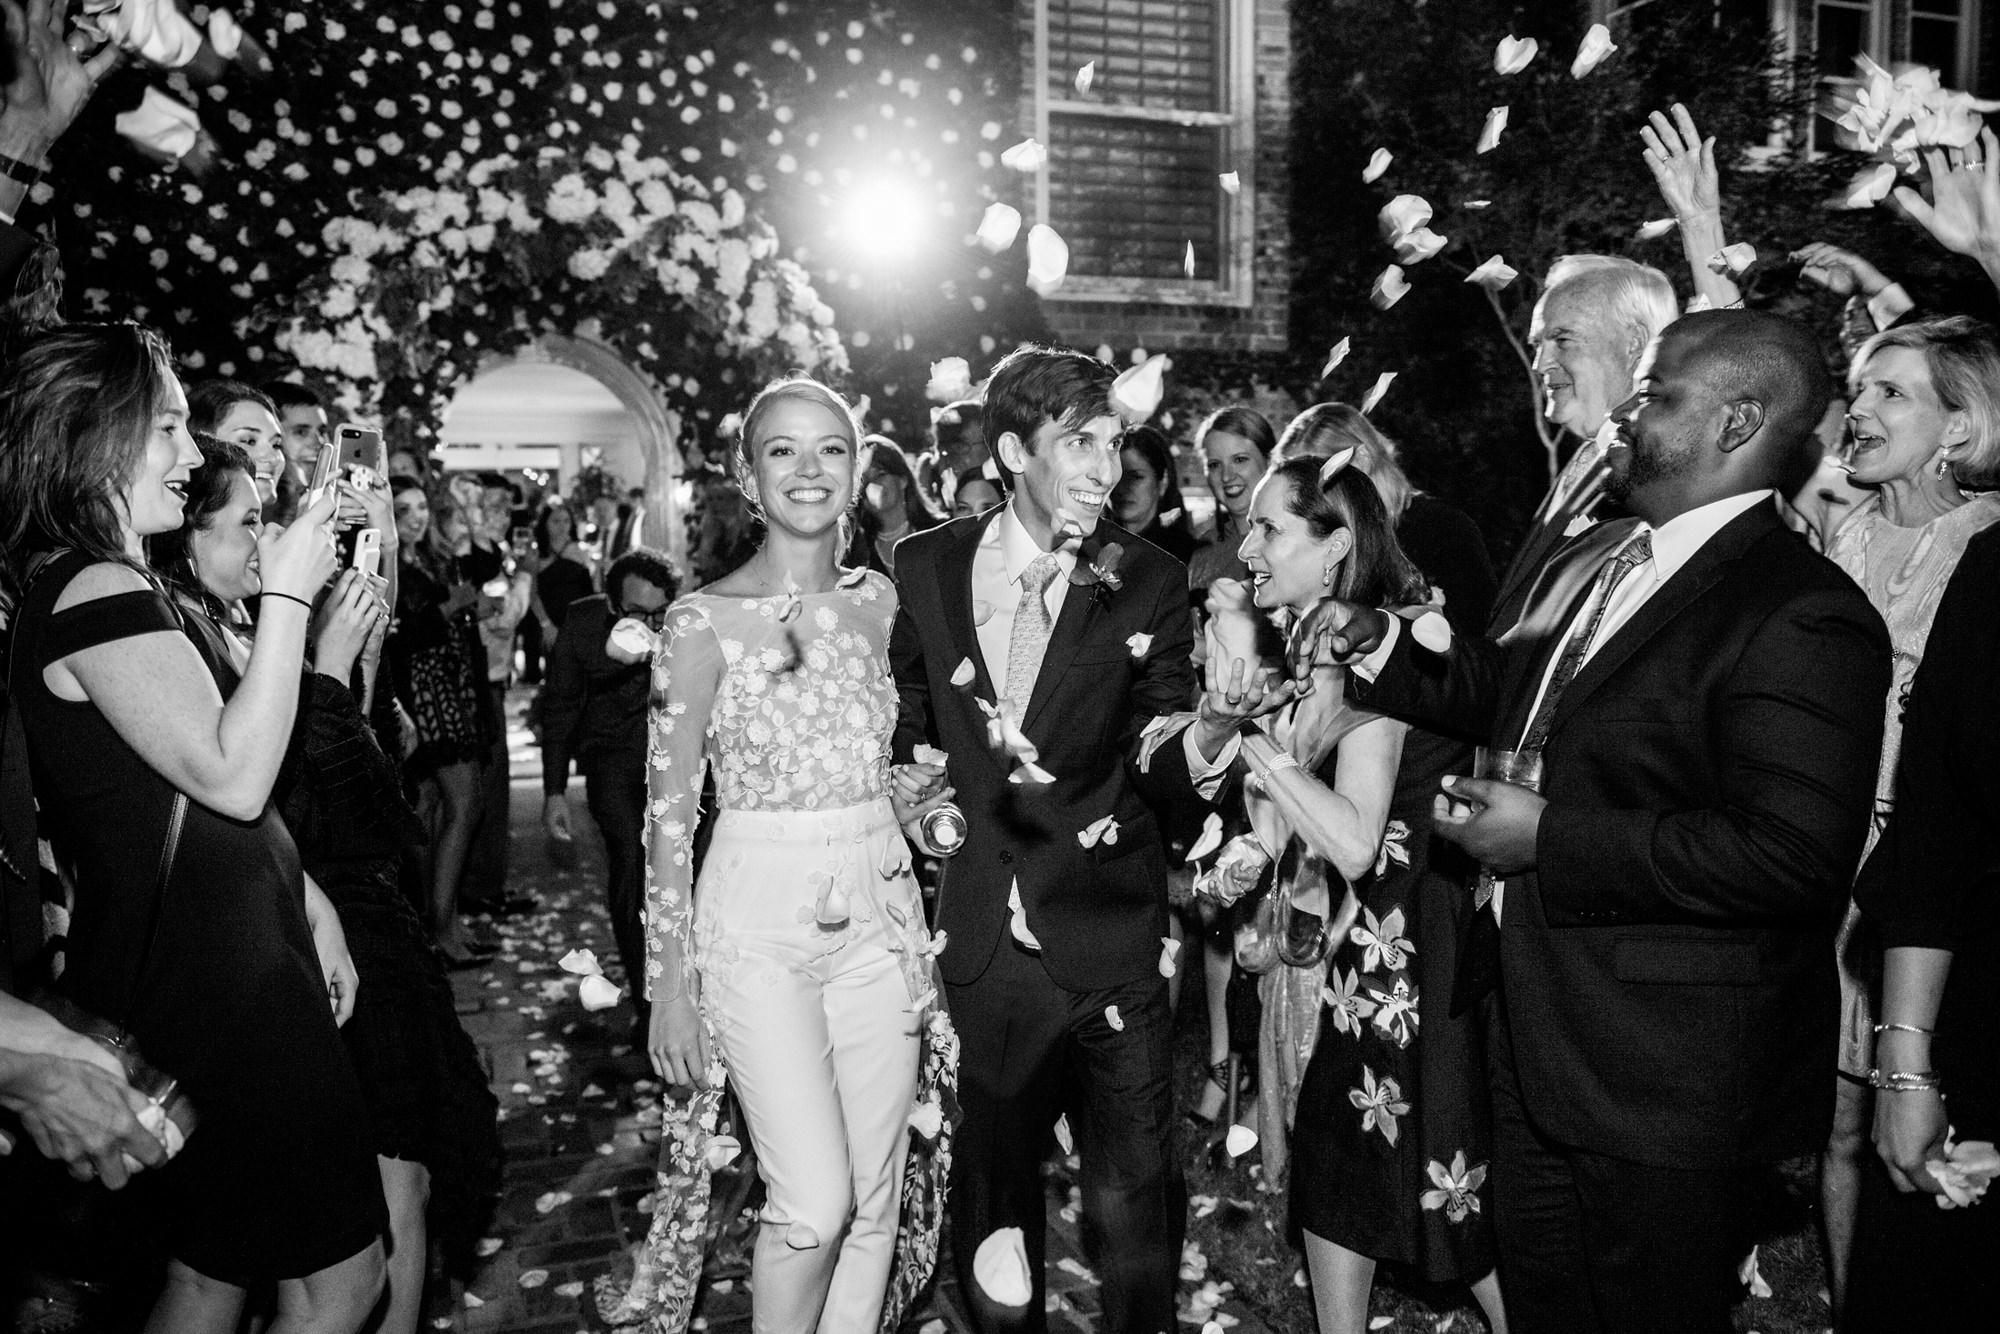 Bride and groom entrance to reception with rose petal confetti, by Morgan Lynn Razi